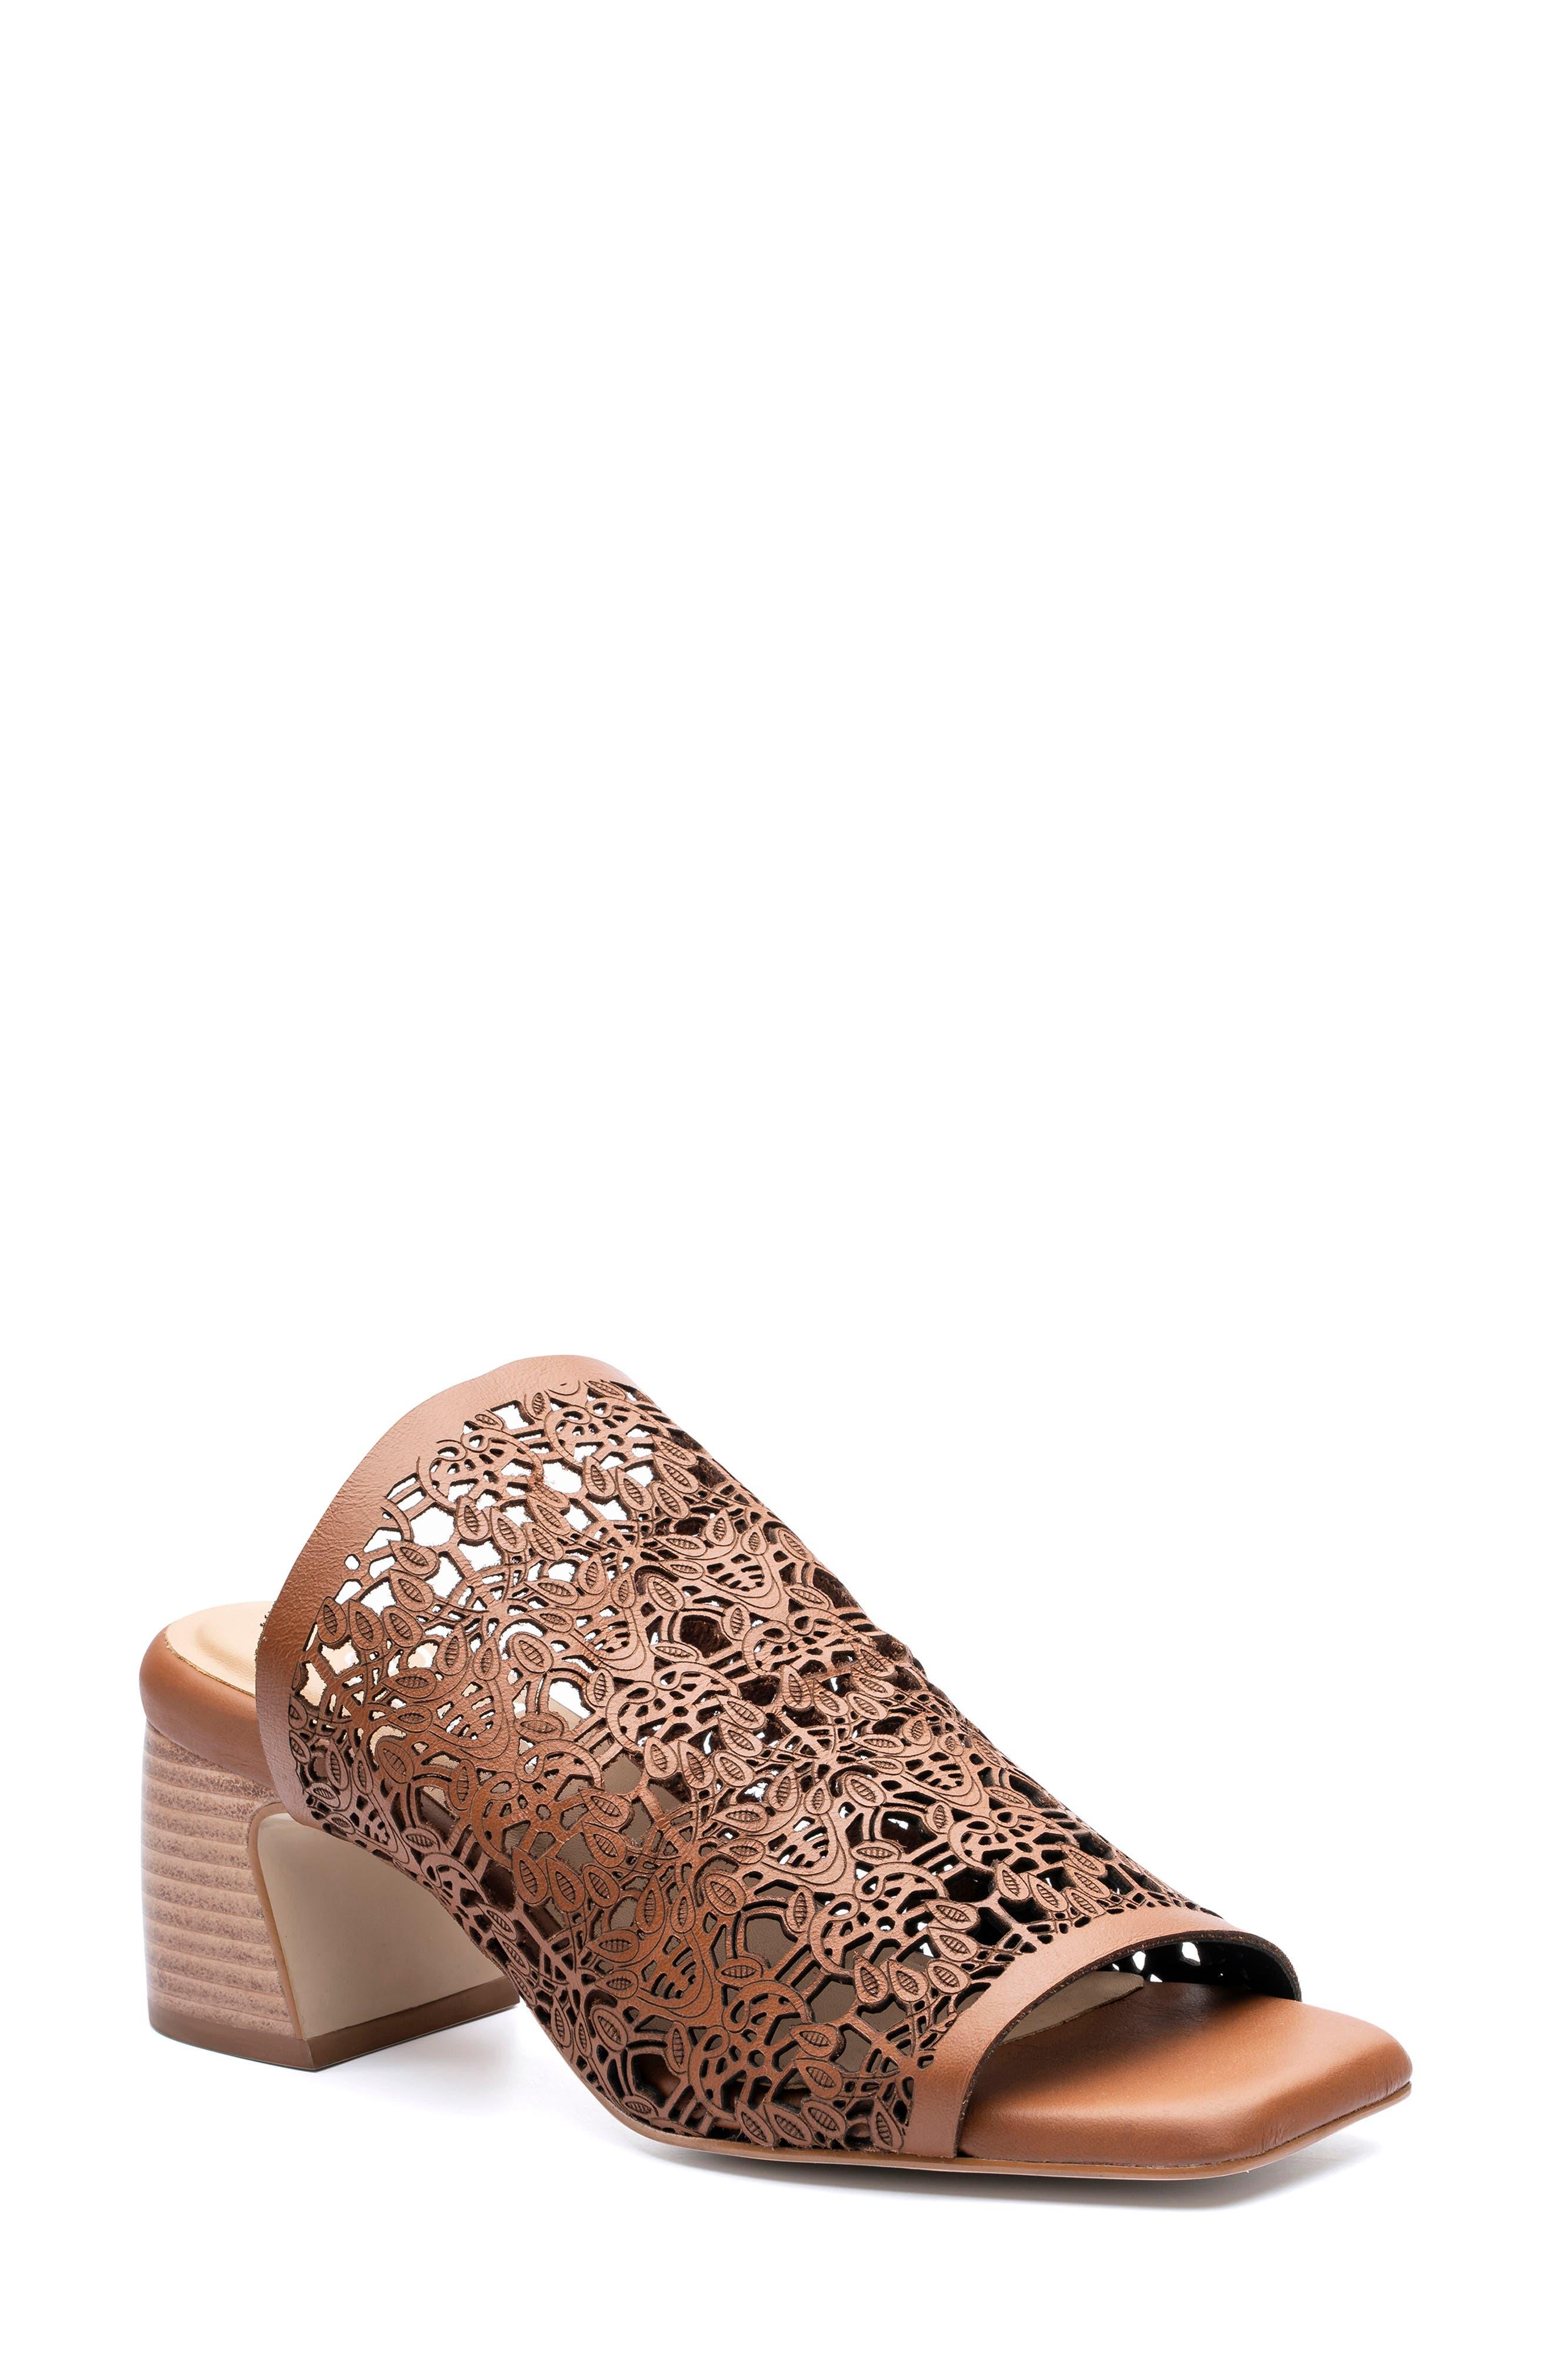 Lazery Slide Sandal